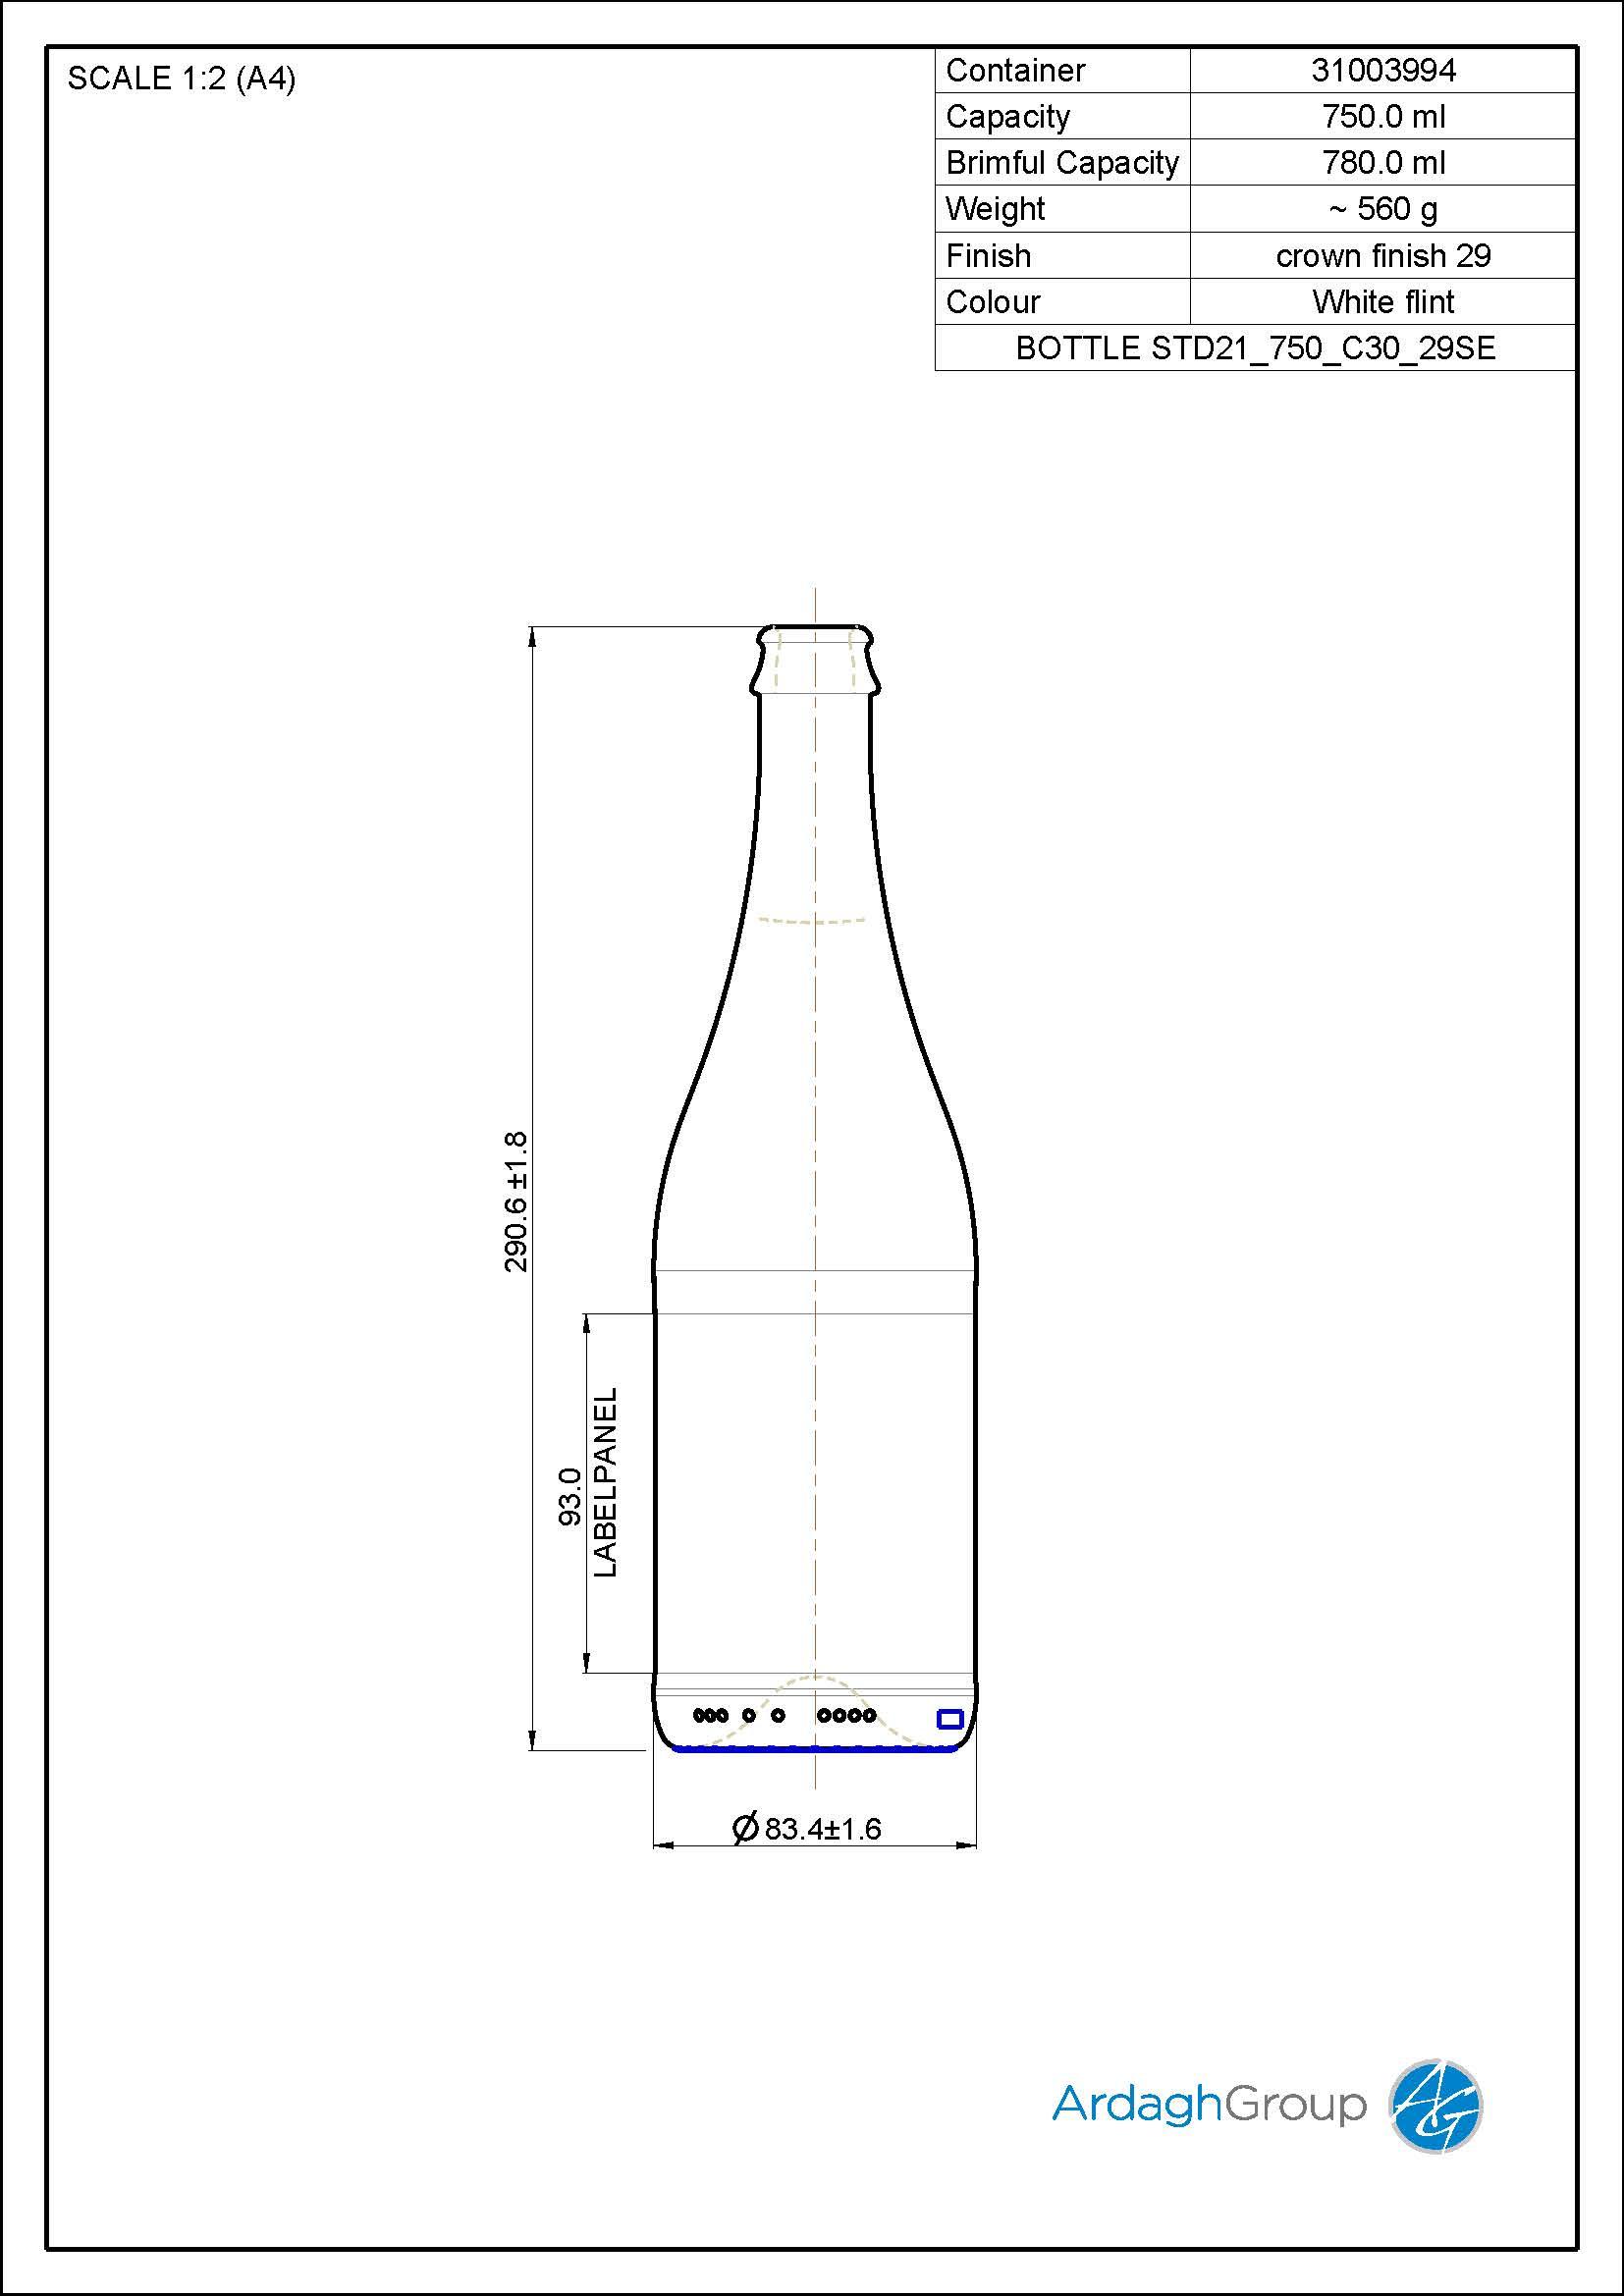 Bottle STD21 750 C30 29SE